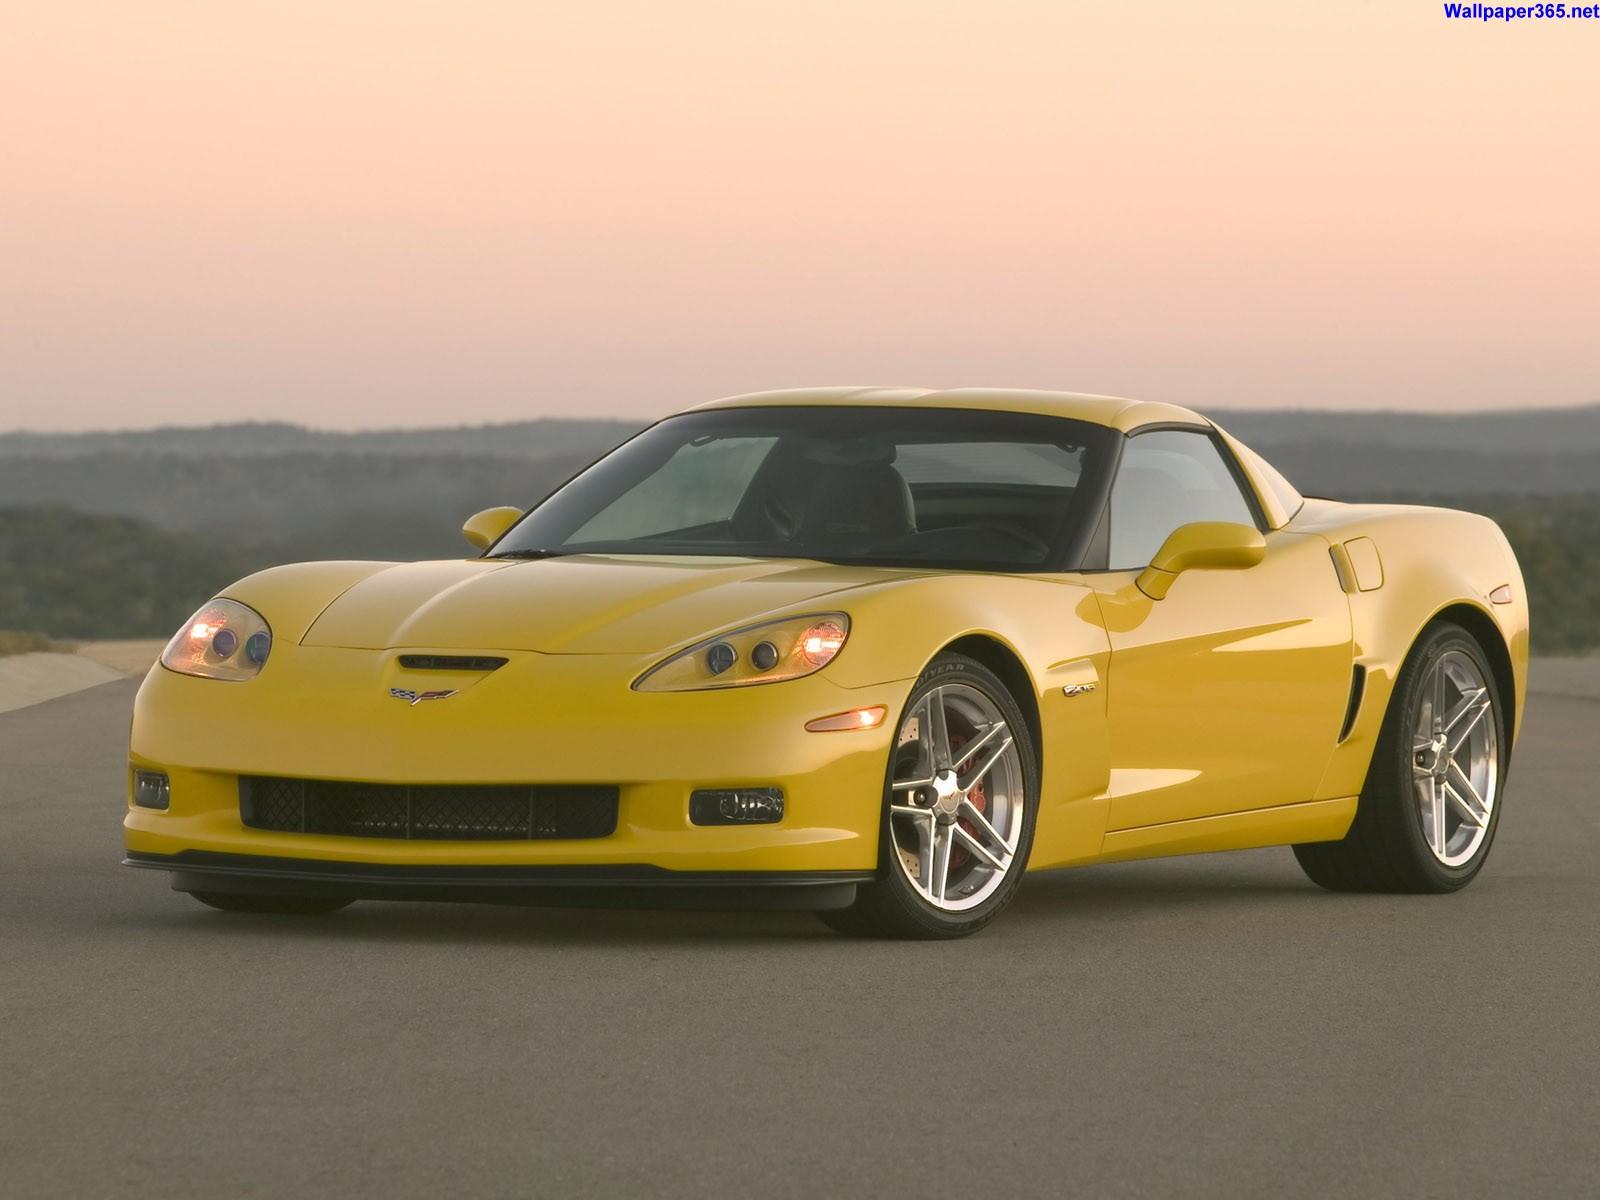 http://2.bp.blogspot.com/-B9n0aHRn5eQ/TpzZ-bGJV7I/AAAAAAAAAd8/czFNZn9eB9g/s1600/Chevrolet+Corvette+%25283%2529.jpg